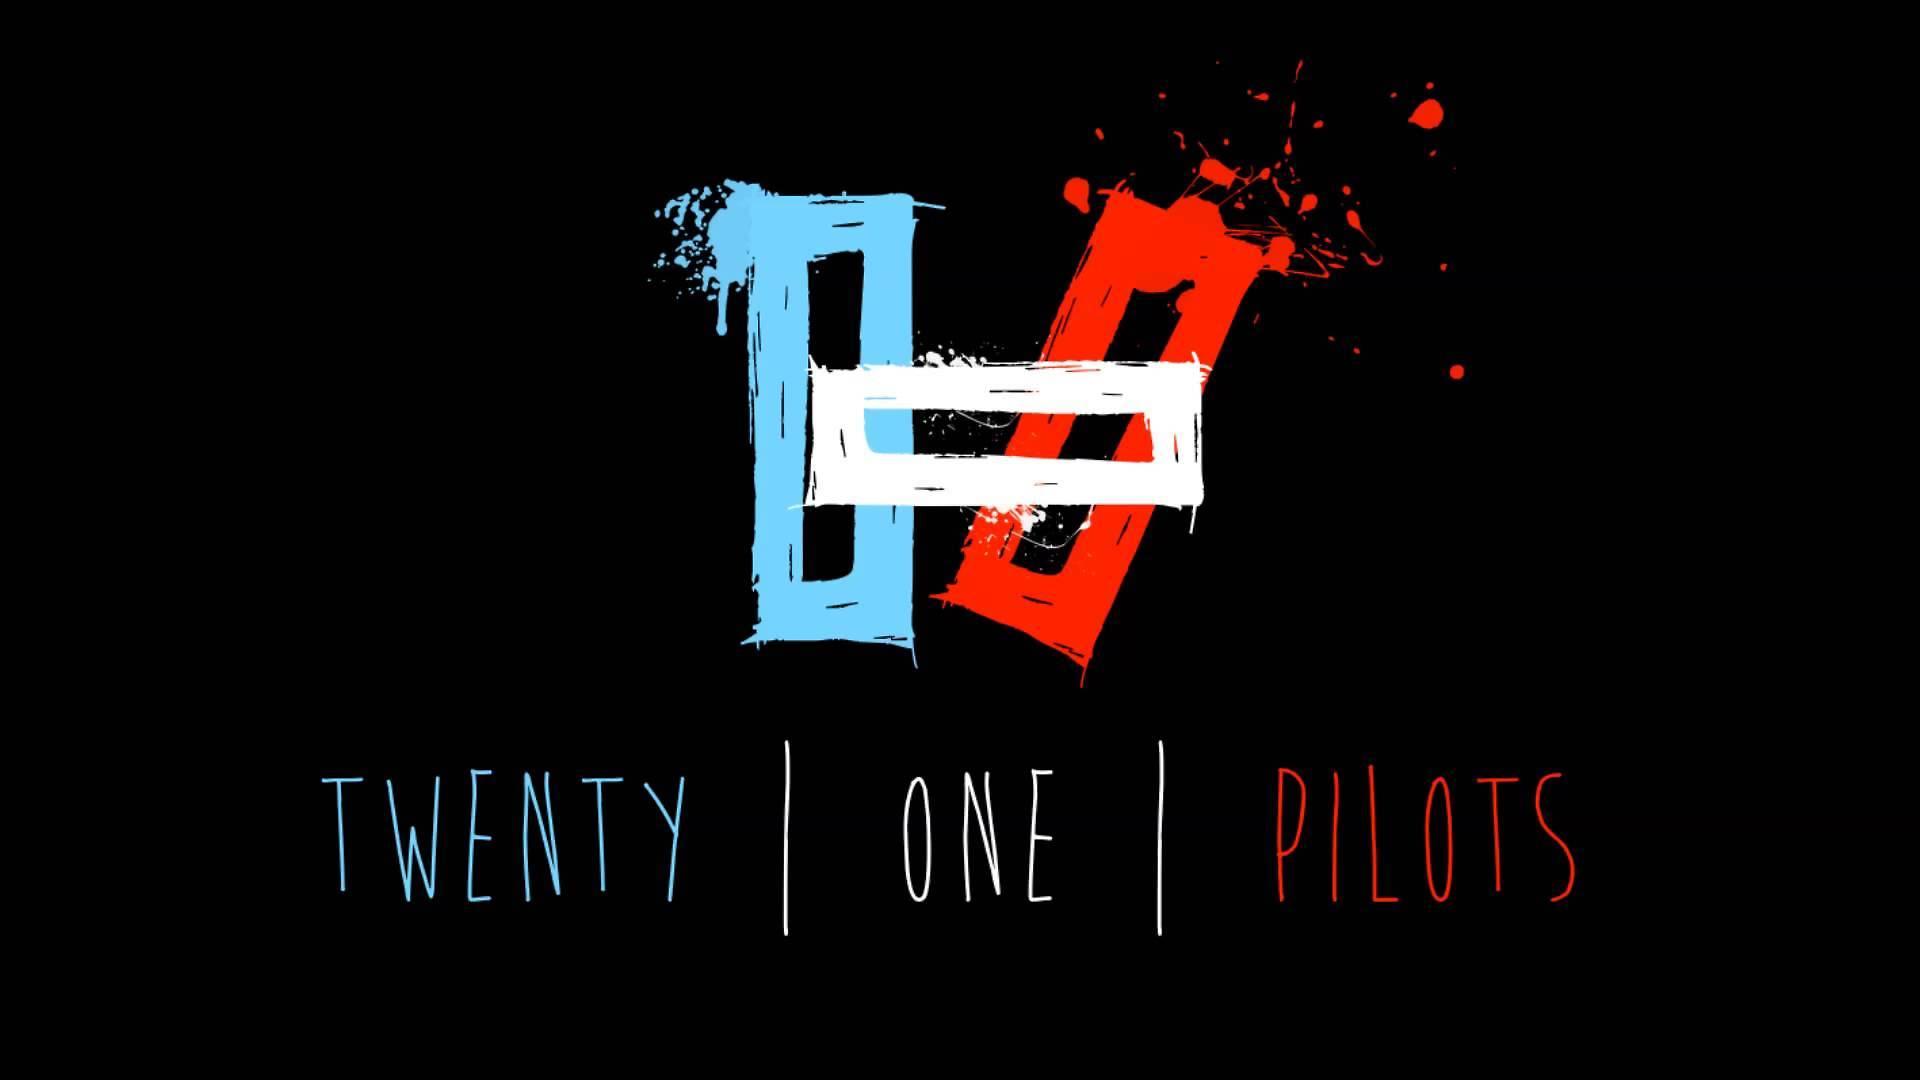 What Twenty One Pilots Era Are You